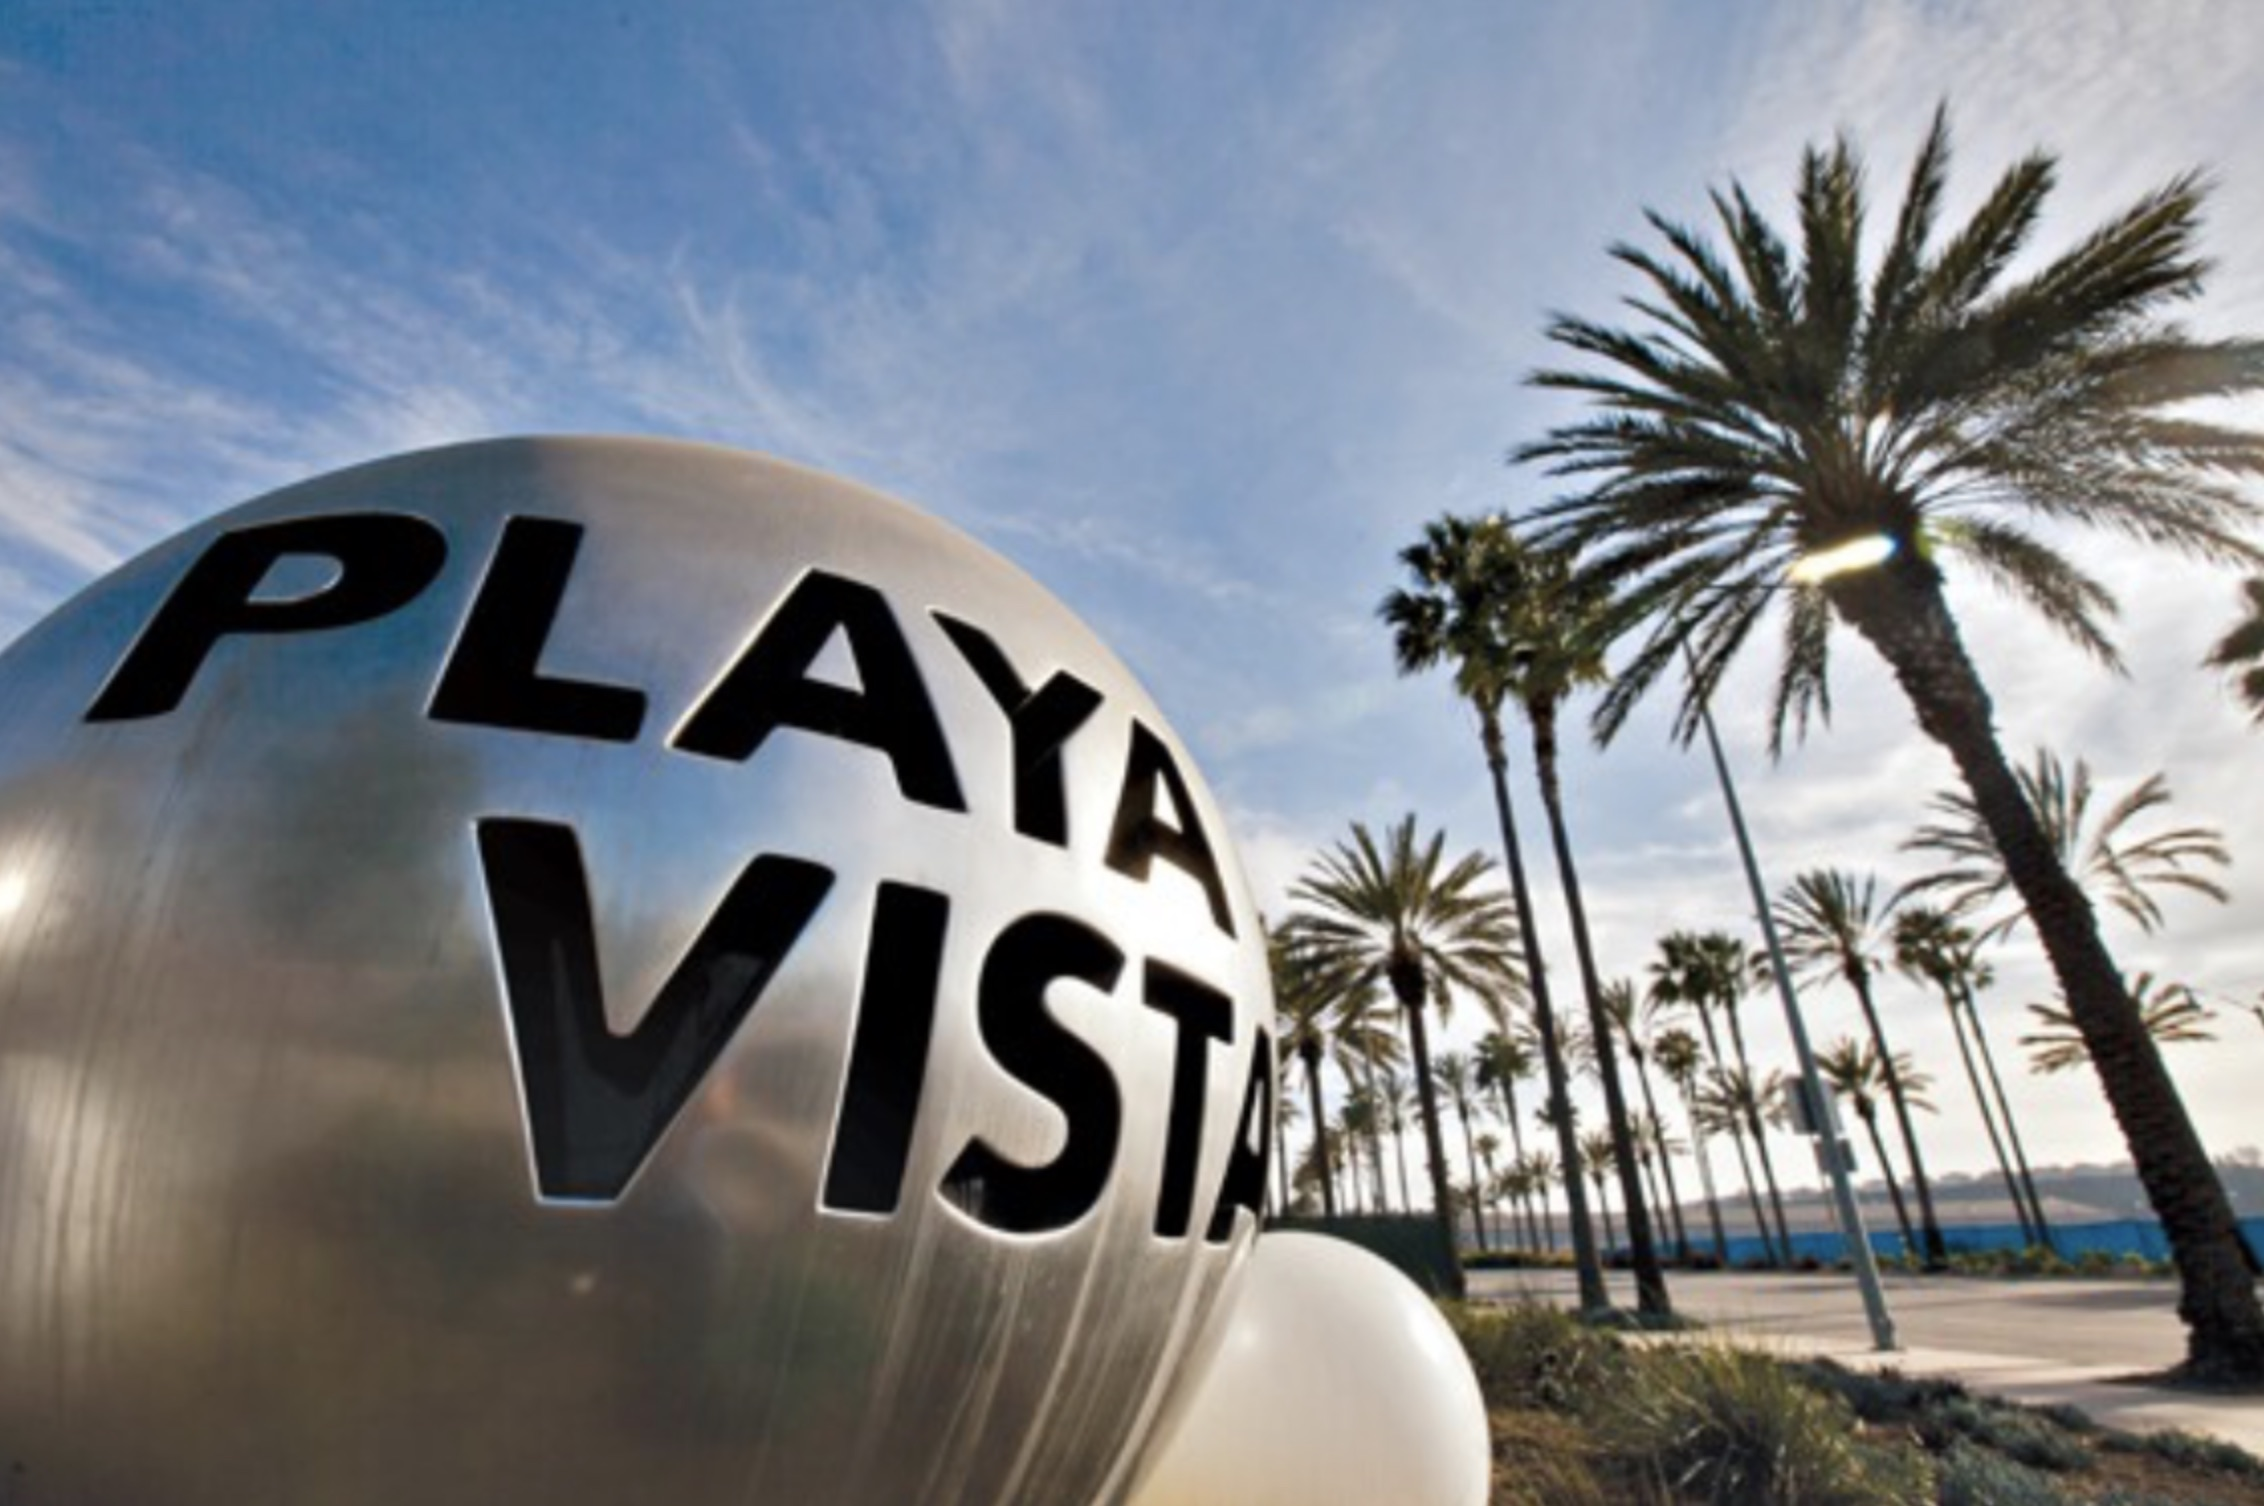 Playa Vista - California